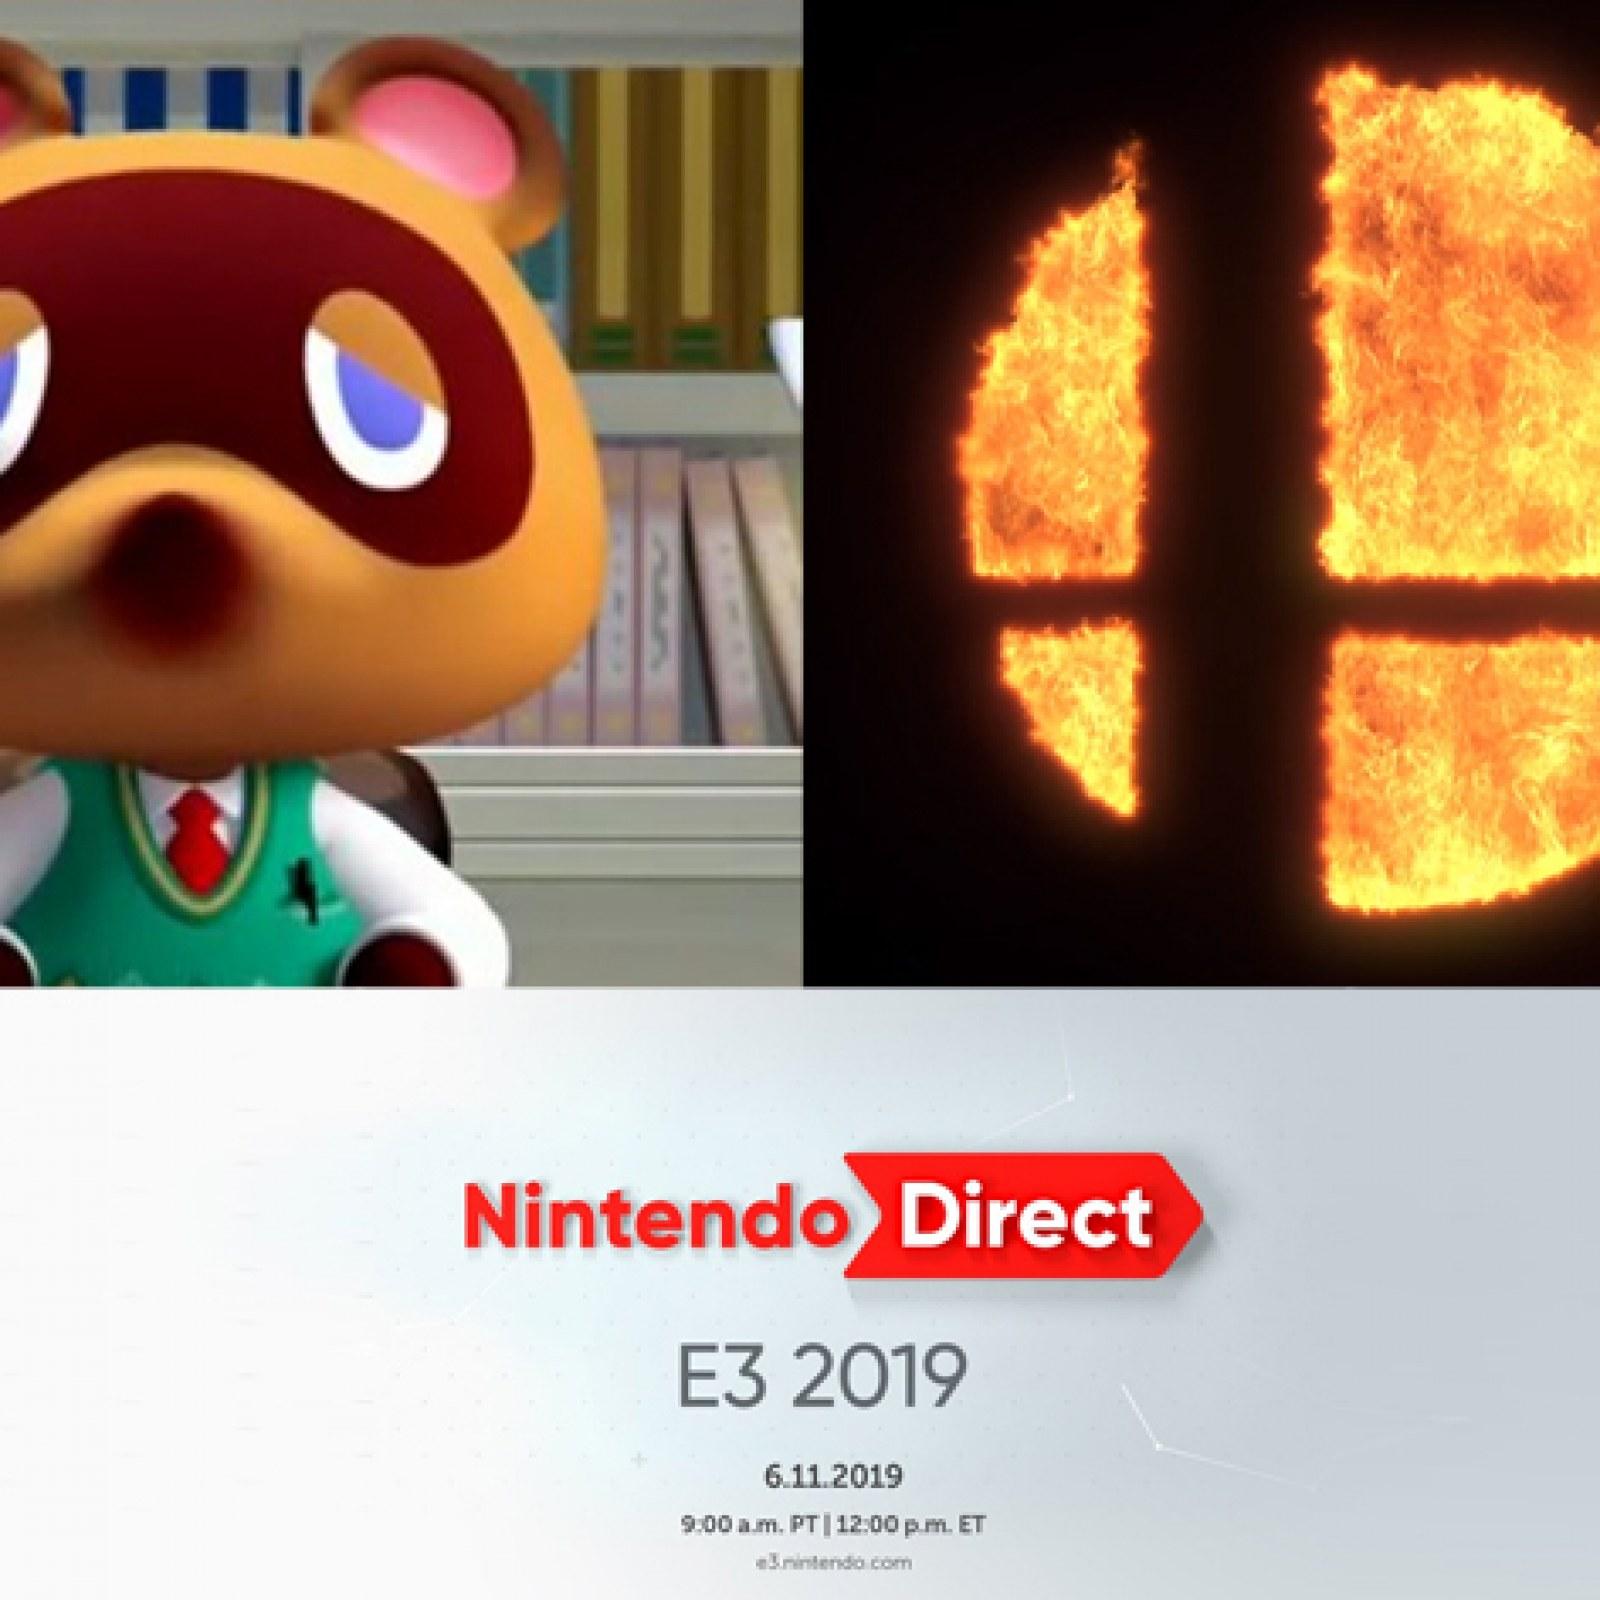 Nintendo Direct E3 Predictions: 'Smash Ultimate' DLC